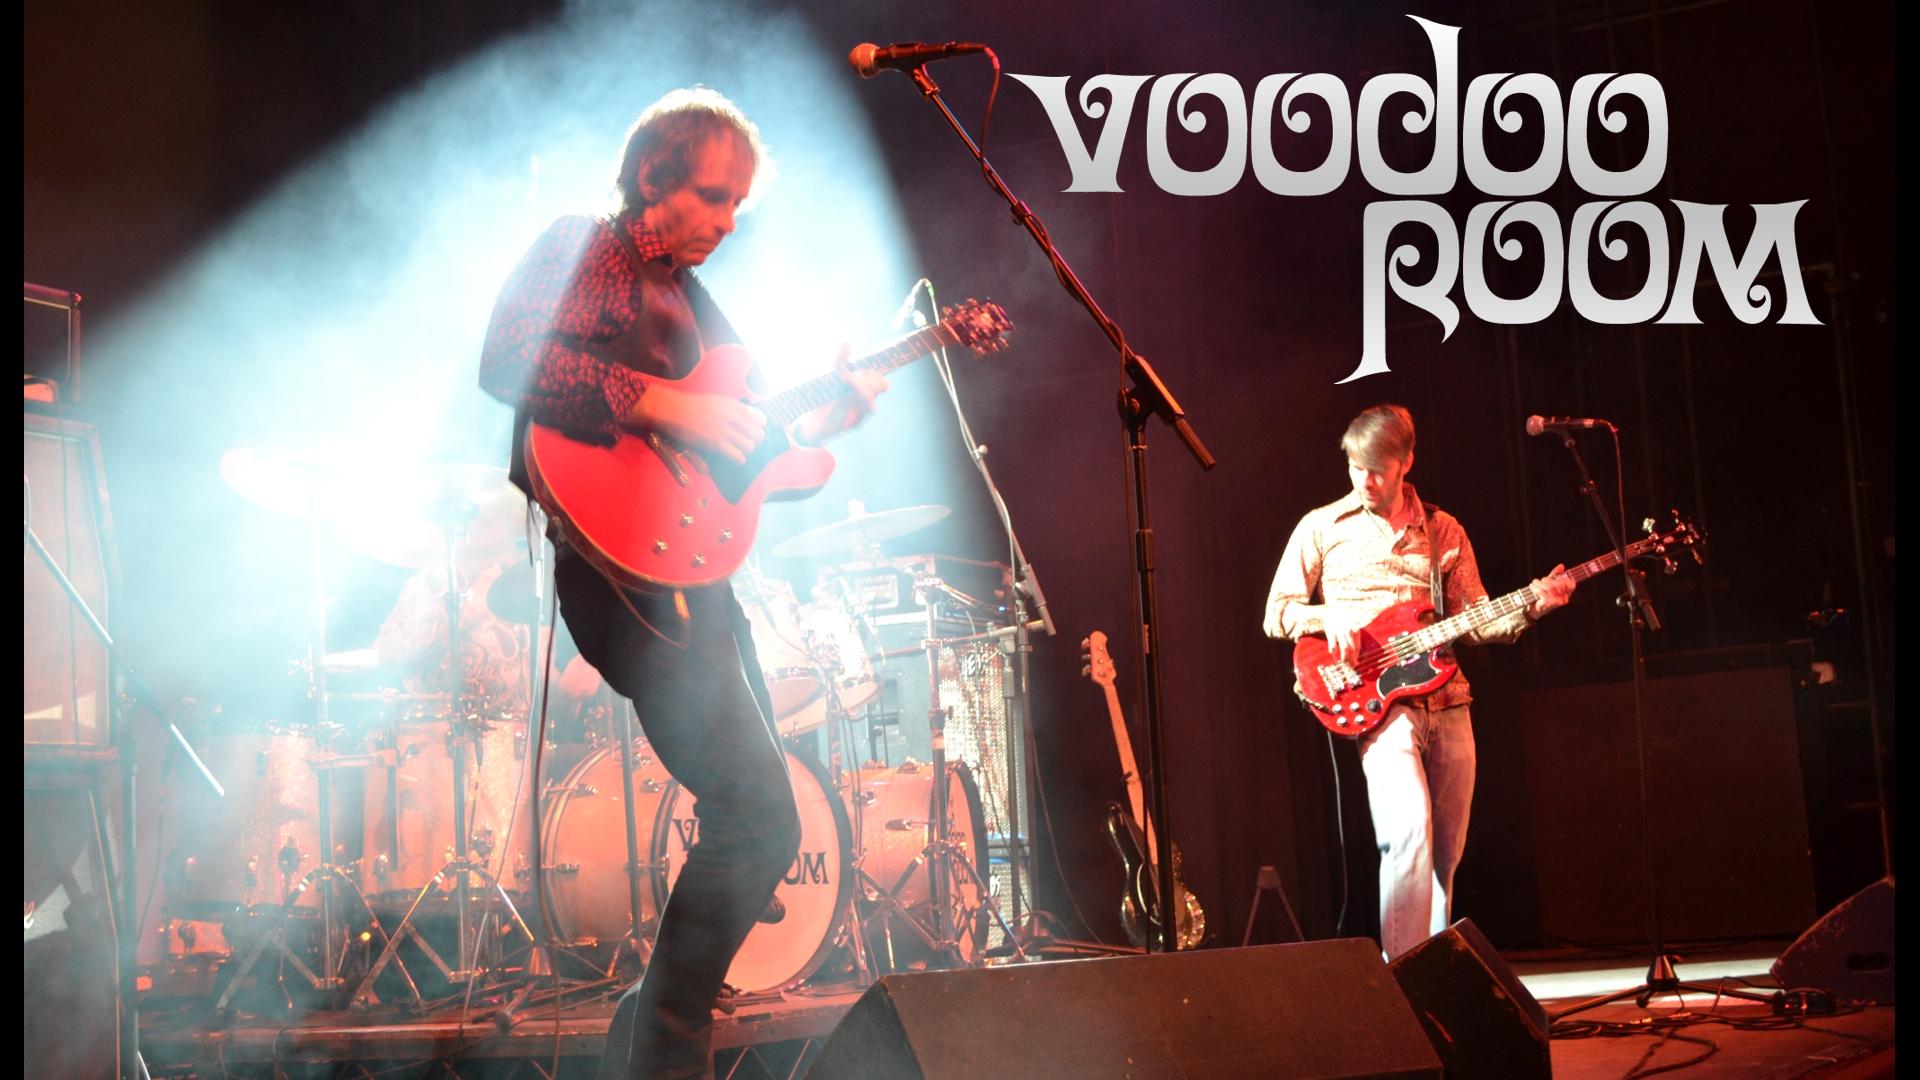 Backstage Kinross Welcomes Voodoo Room